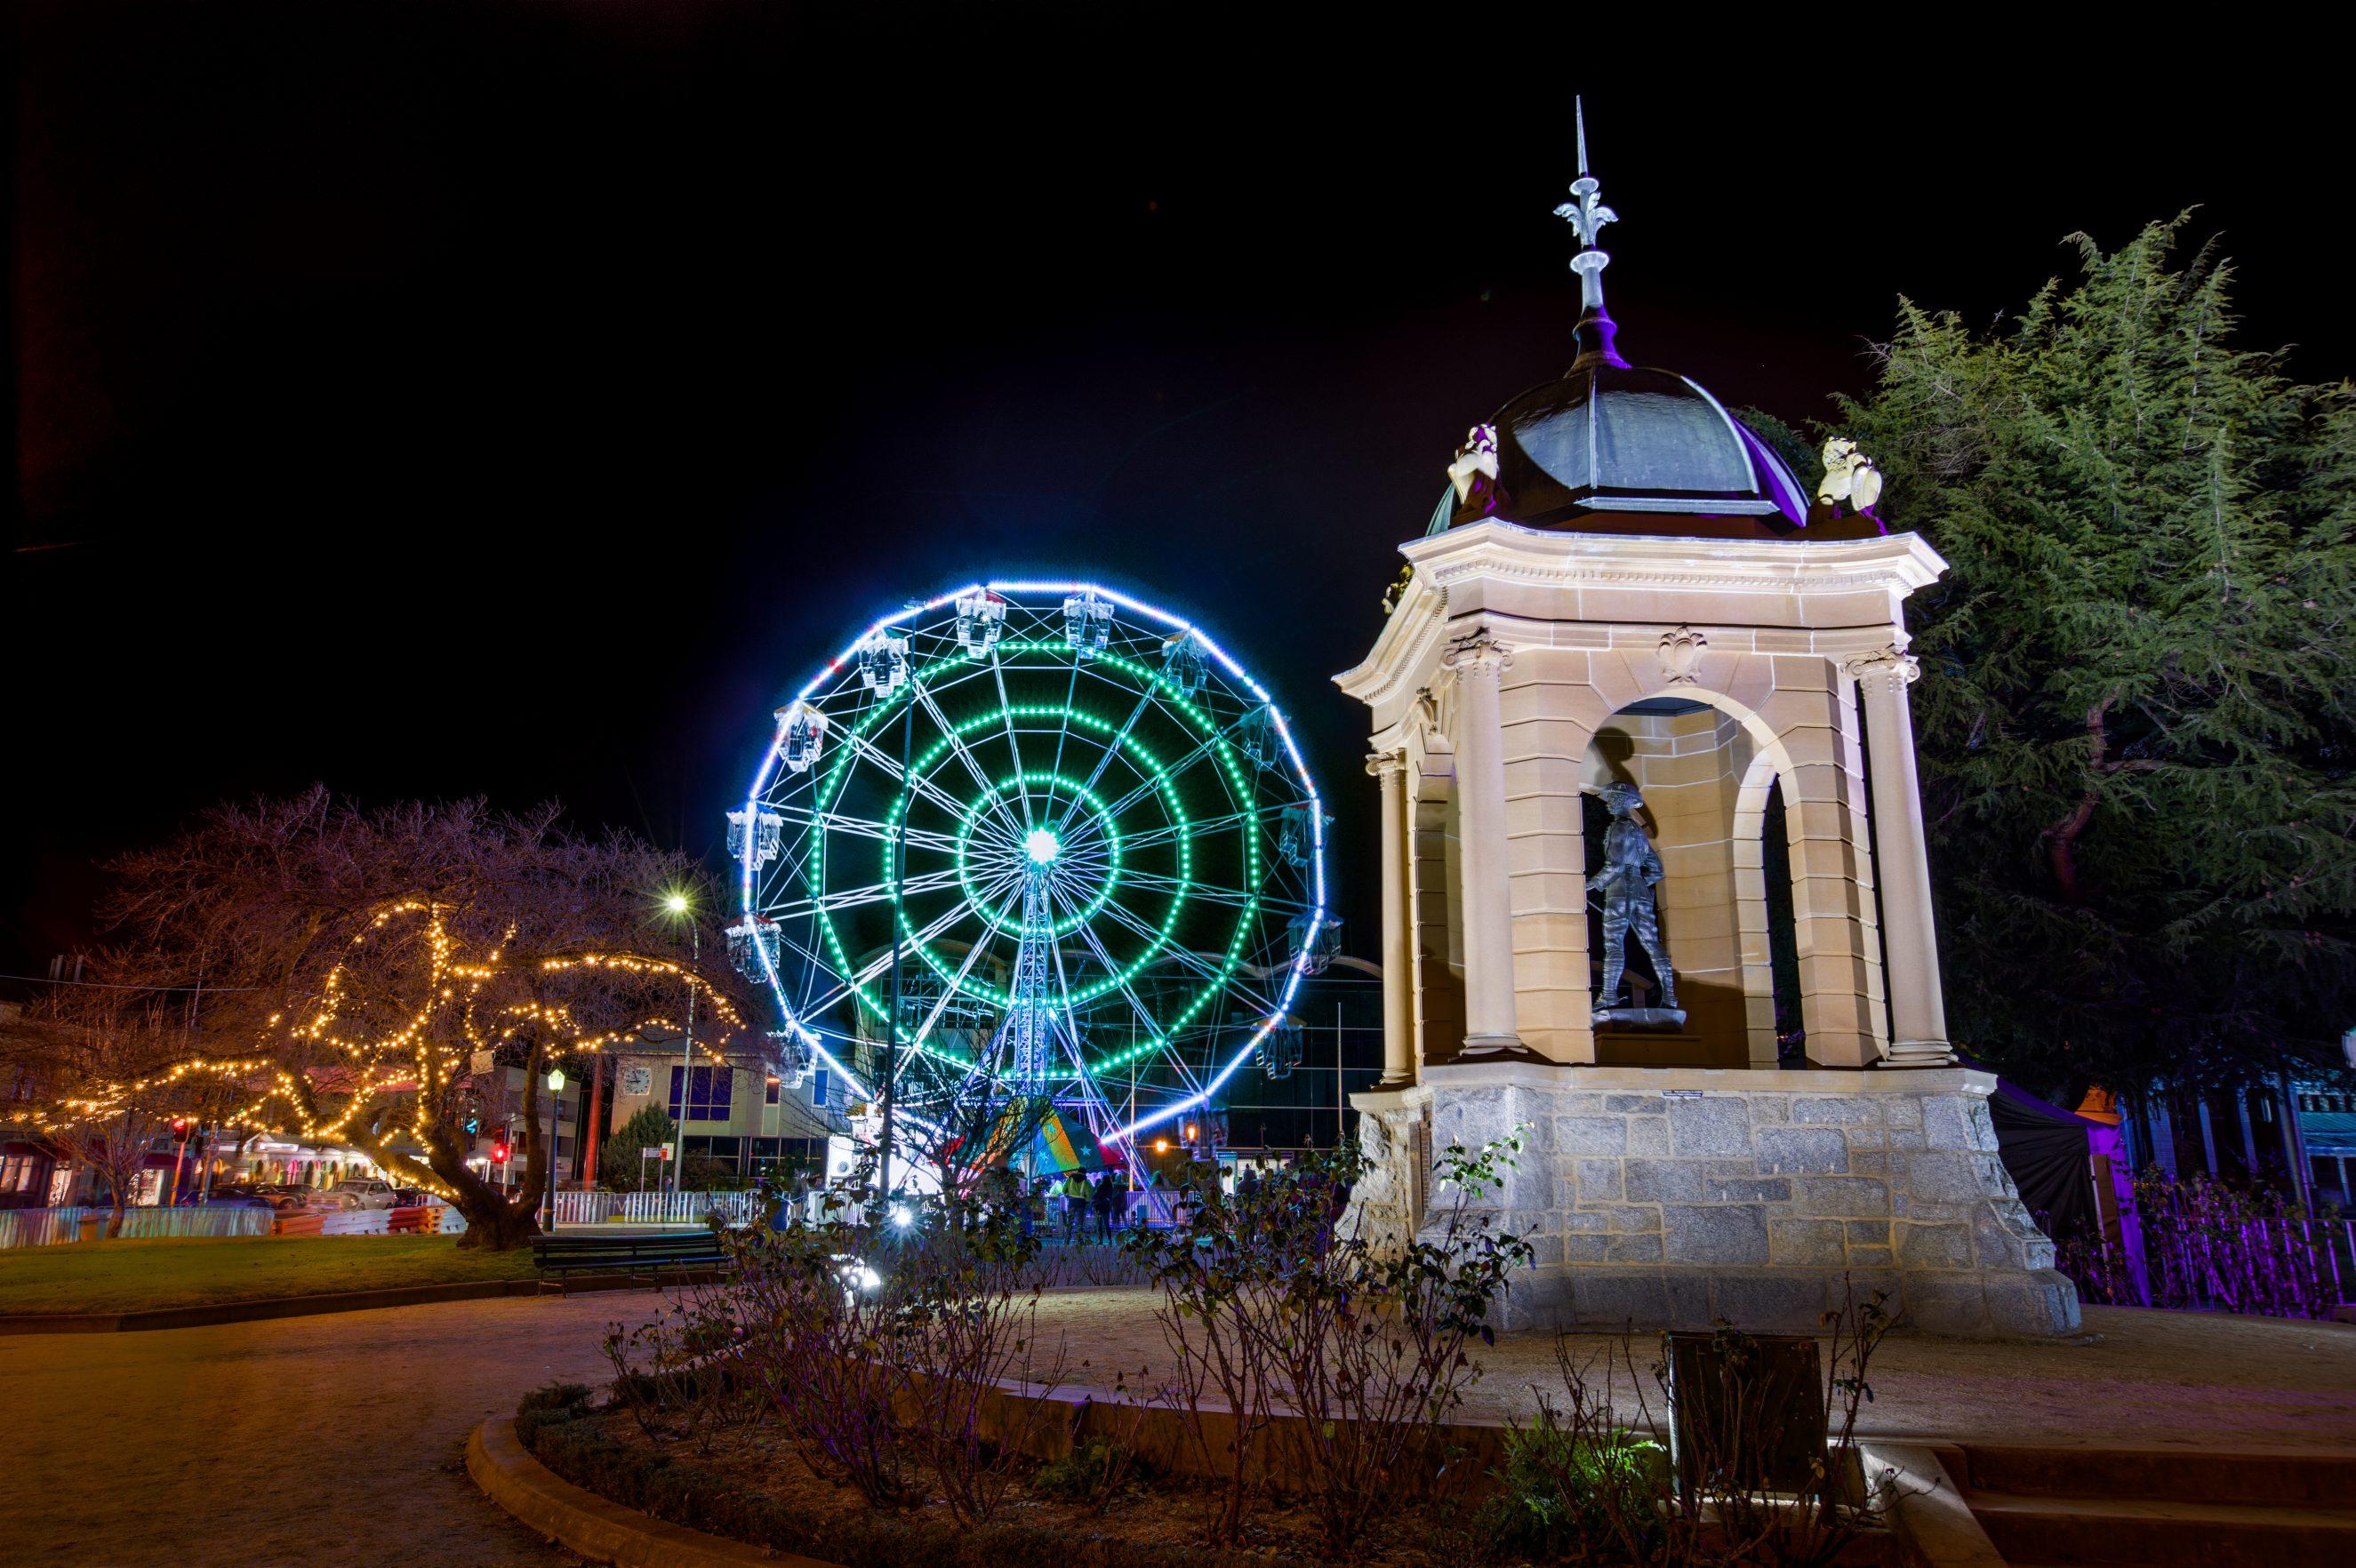 2016 – South African Boer War Memorial and Ferris wheel